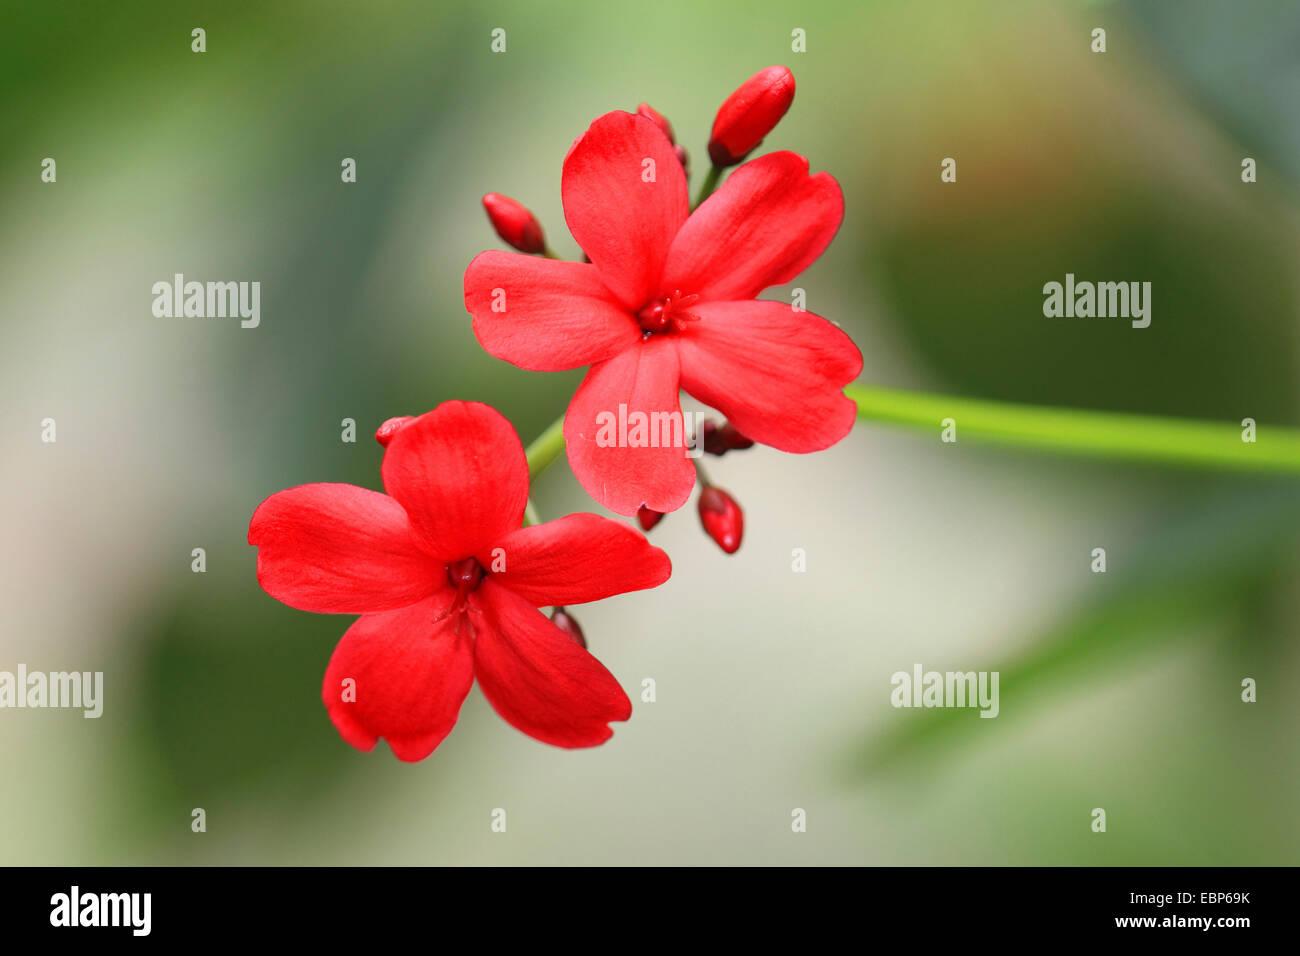 Miss Hongkong (Jatropha integerrima, Jatropha scuminata), flowers - Stock Image